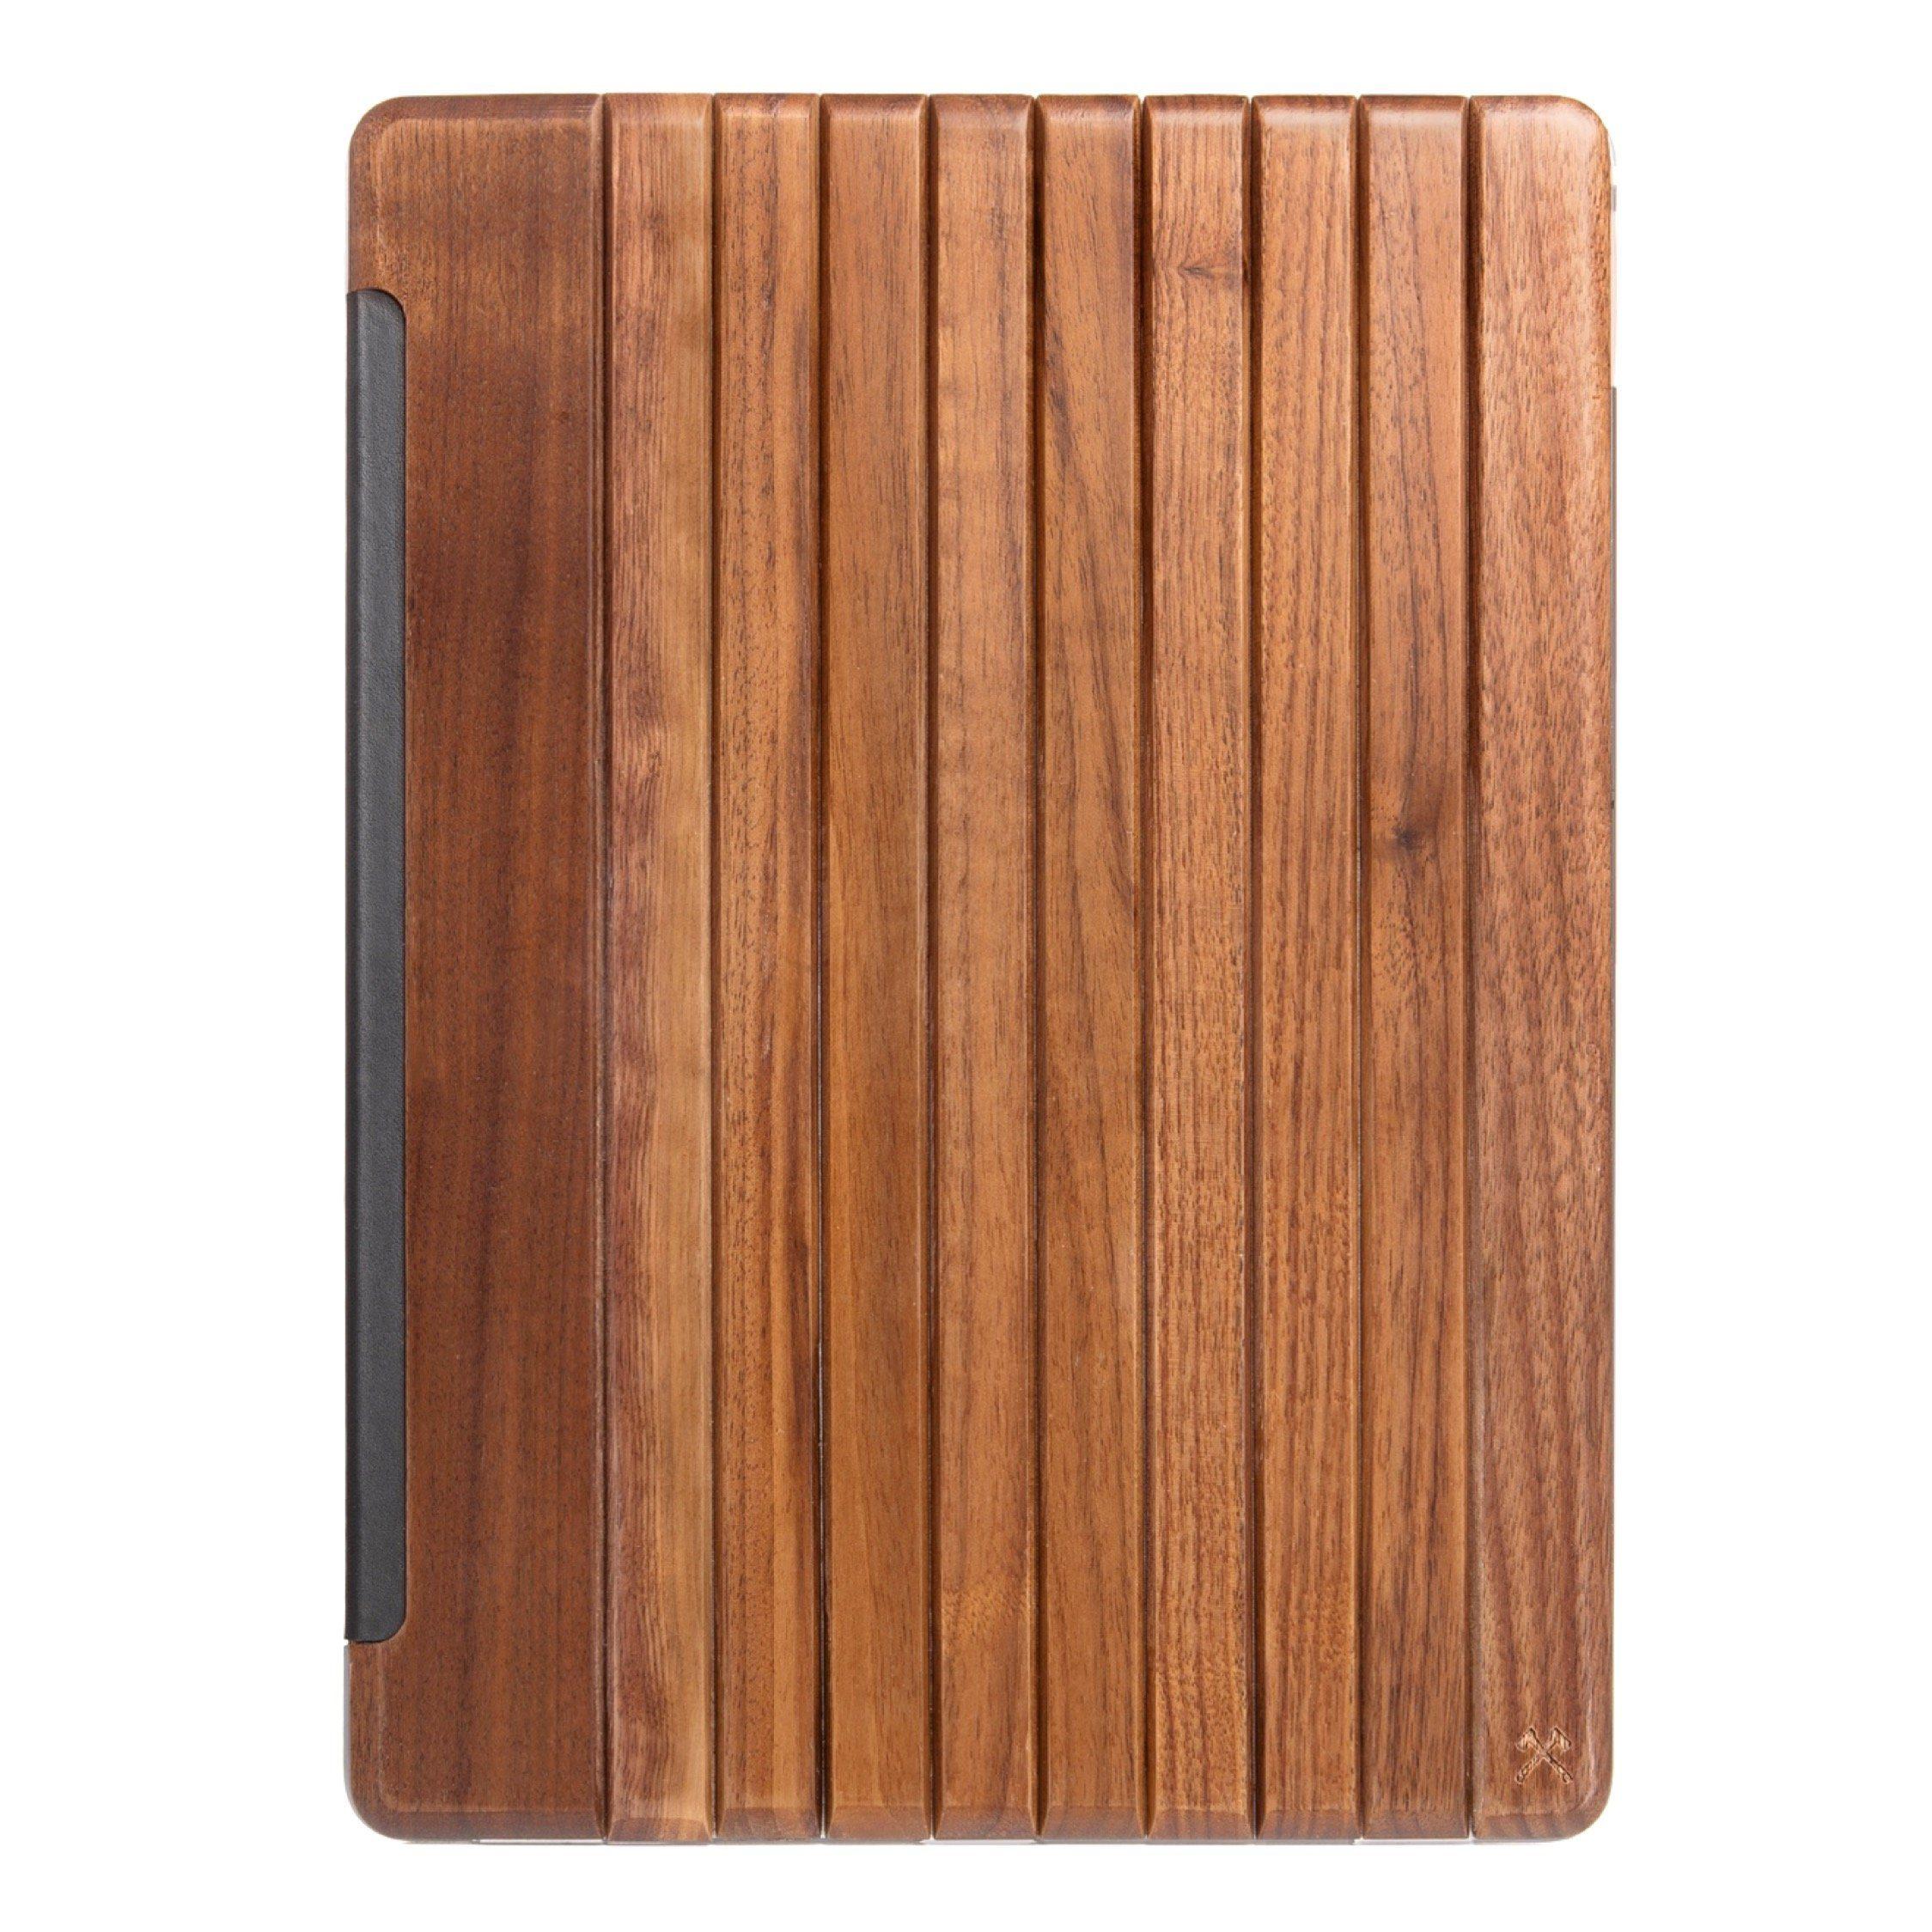 "Woodcessories EcoGuard - Echtholz Case für iPad Pro 12,9""- Procter"